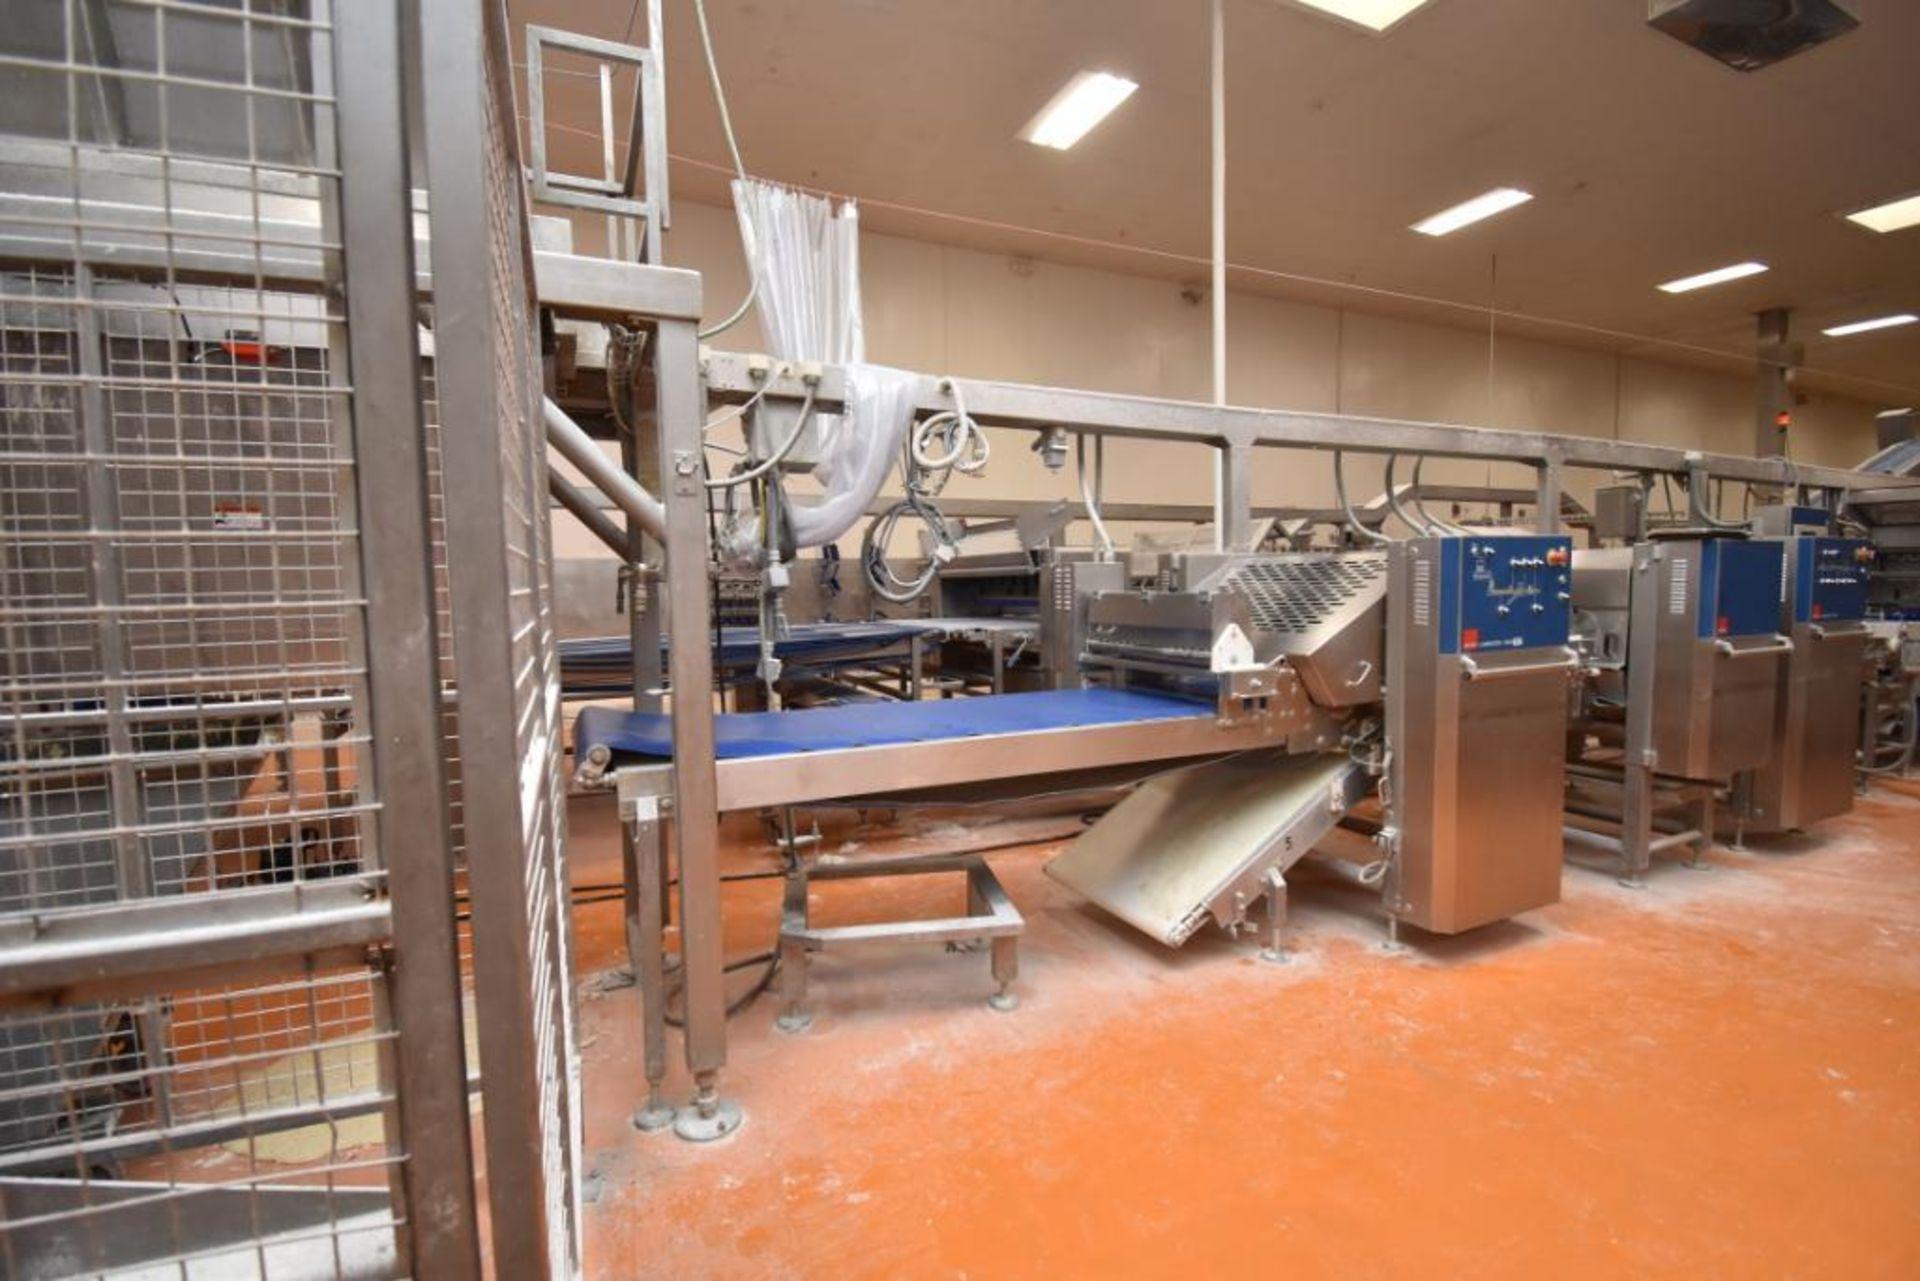 2007 Fritsch Laminator 3000 dough line - Image 54 of 280